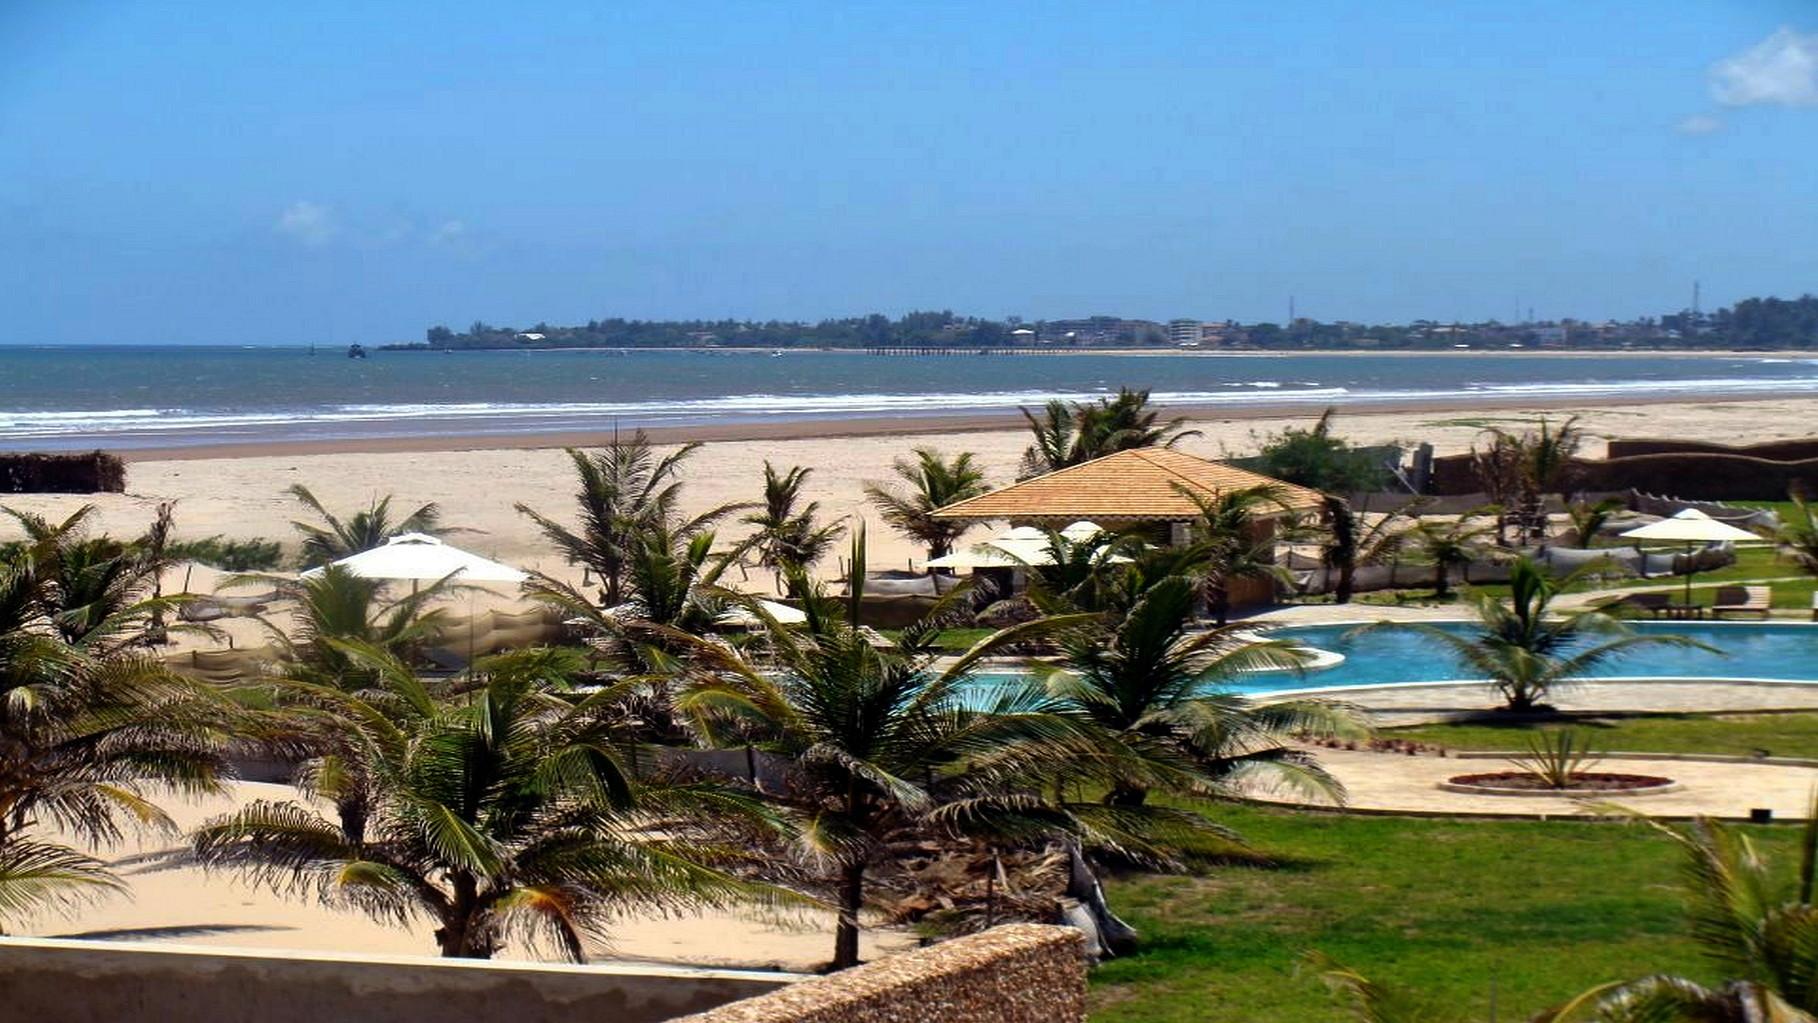 Holiday House Tembo Court Malindi - Beach. Casa Vacanze Tembo Court Malindi -  Spiaggia